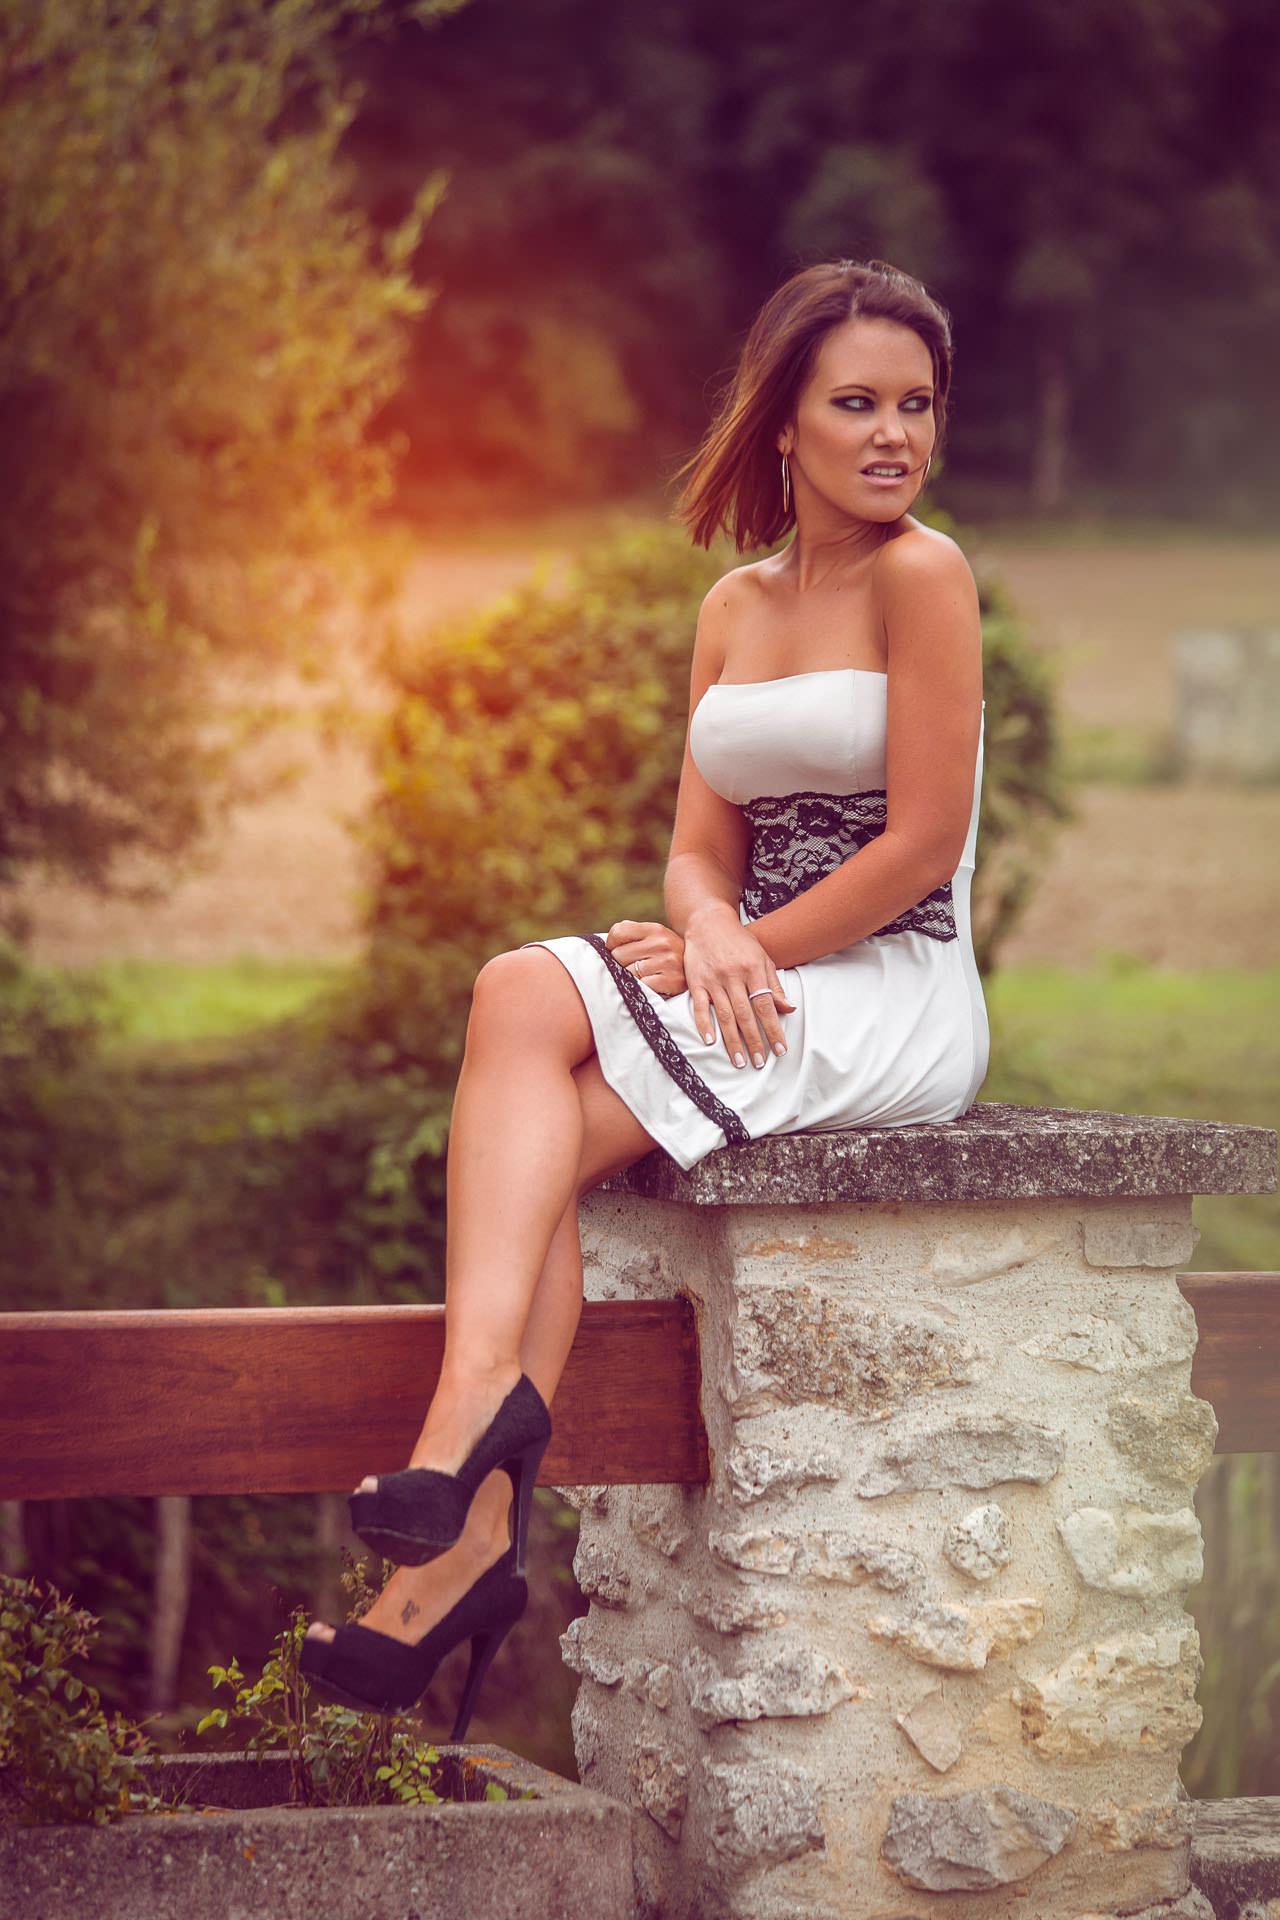 2014-08-19 - Chérie - Dannemois - 9751 - 1920px